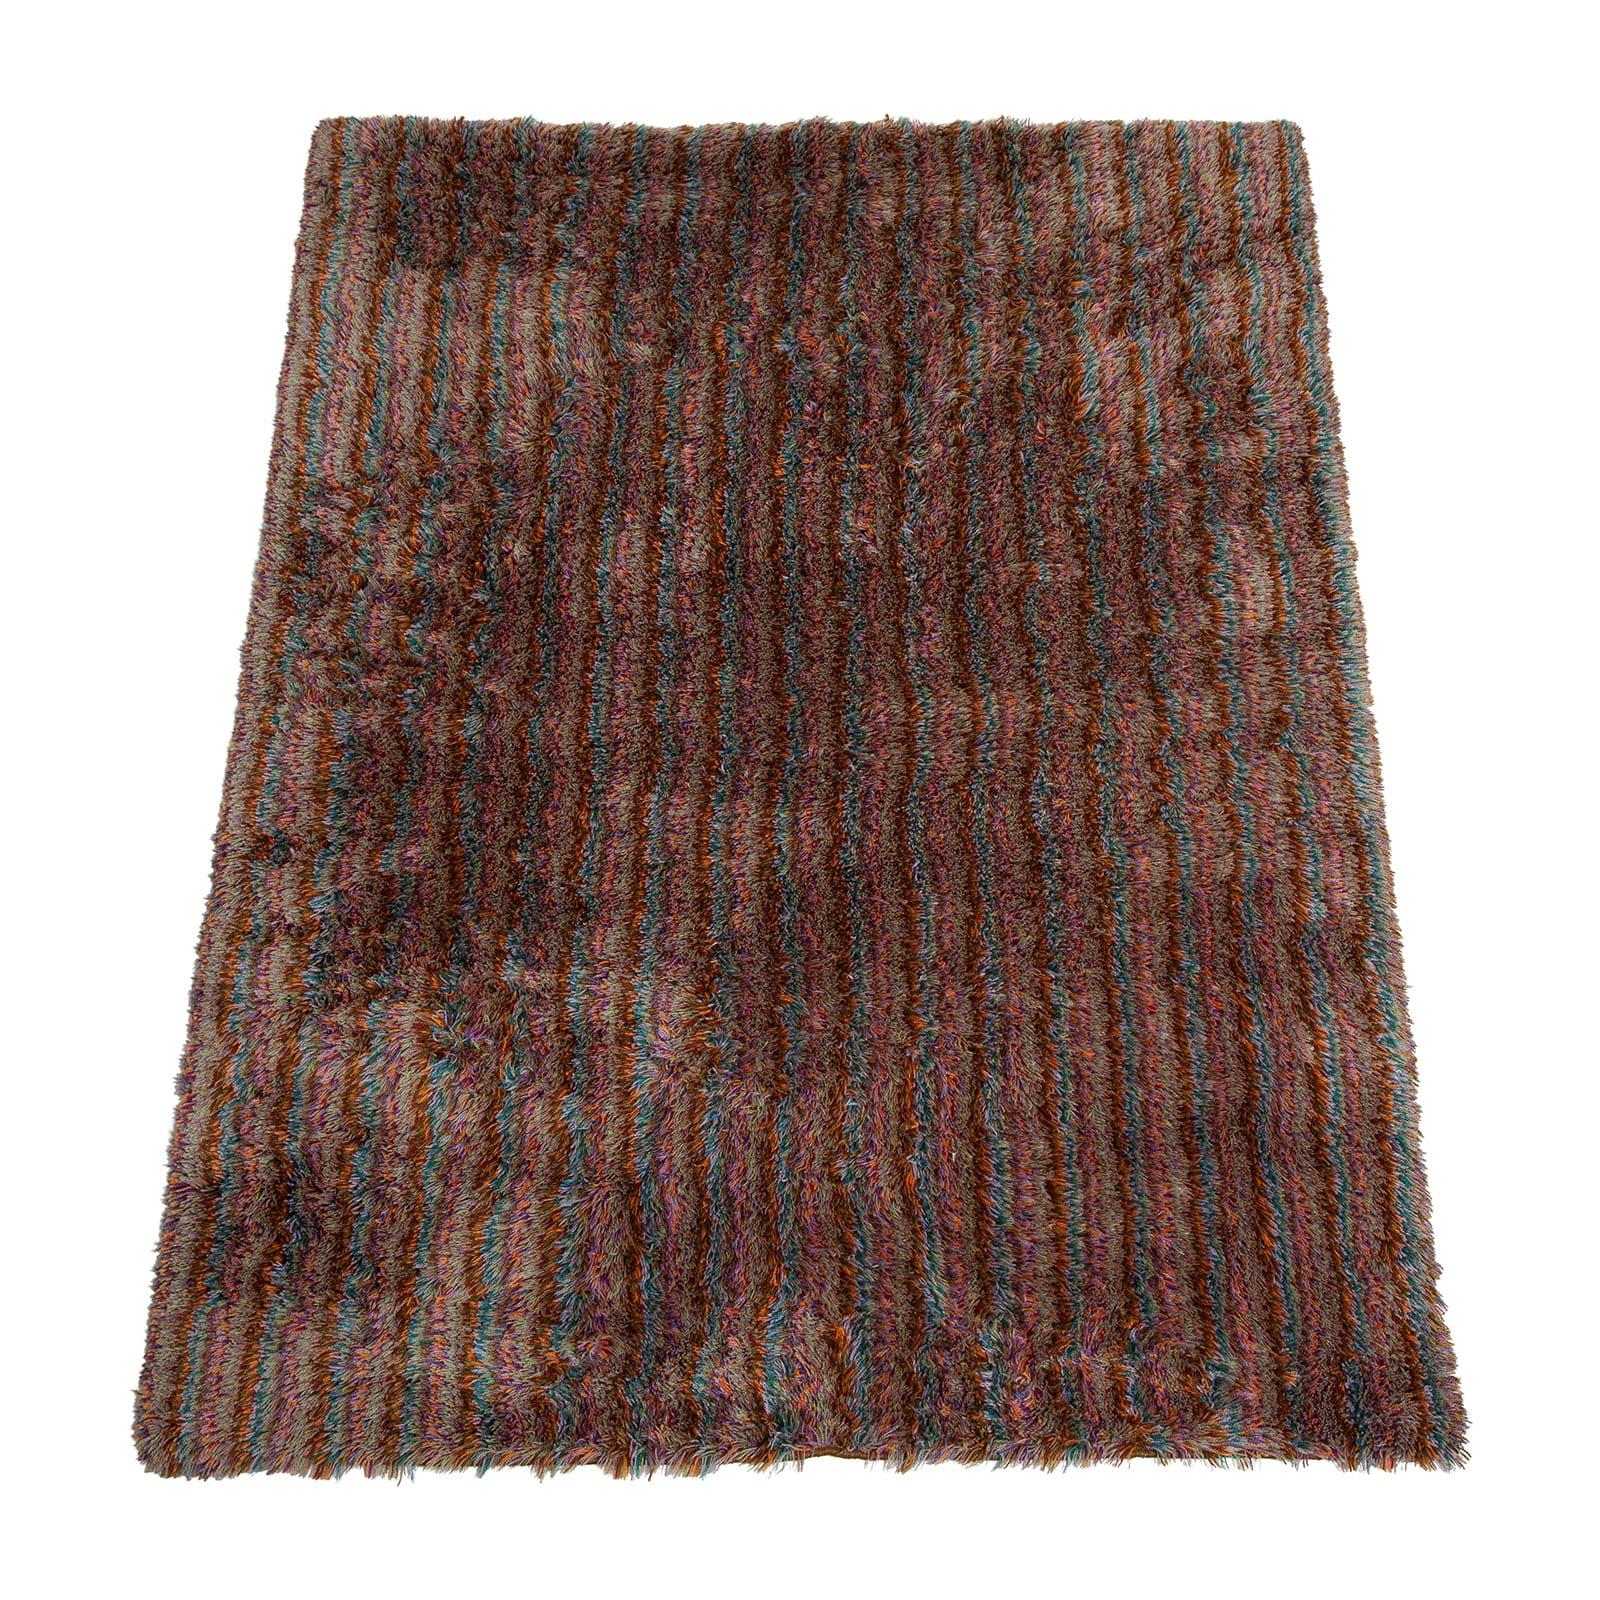 A rya rug